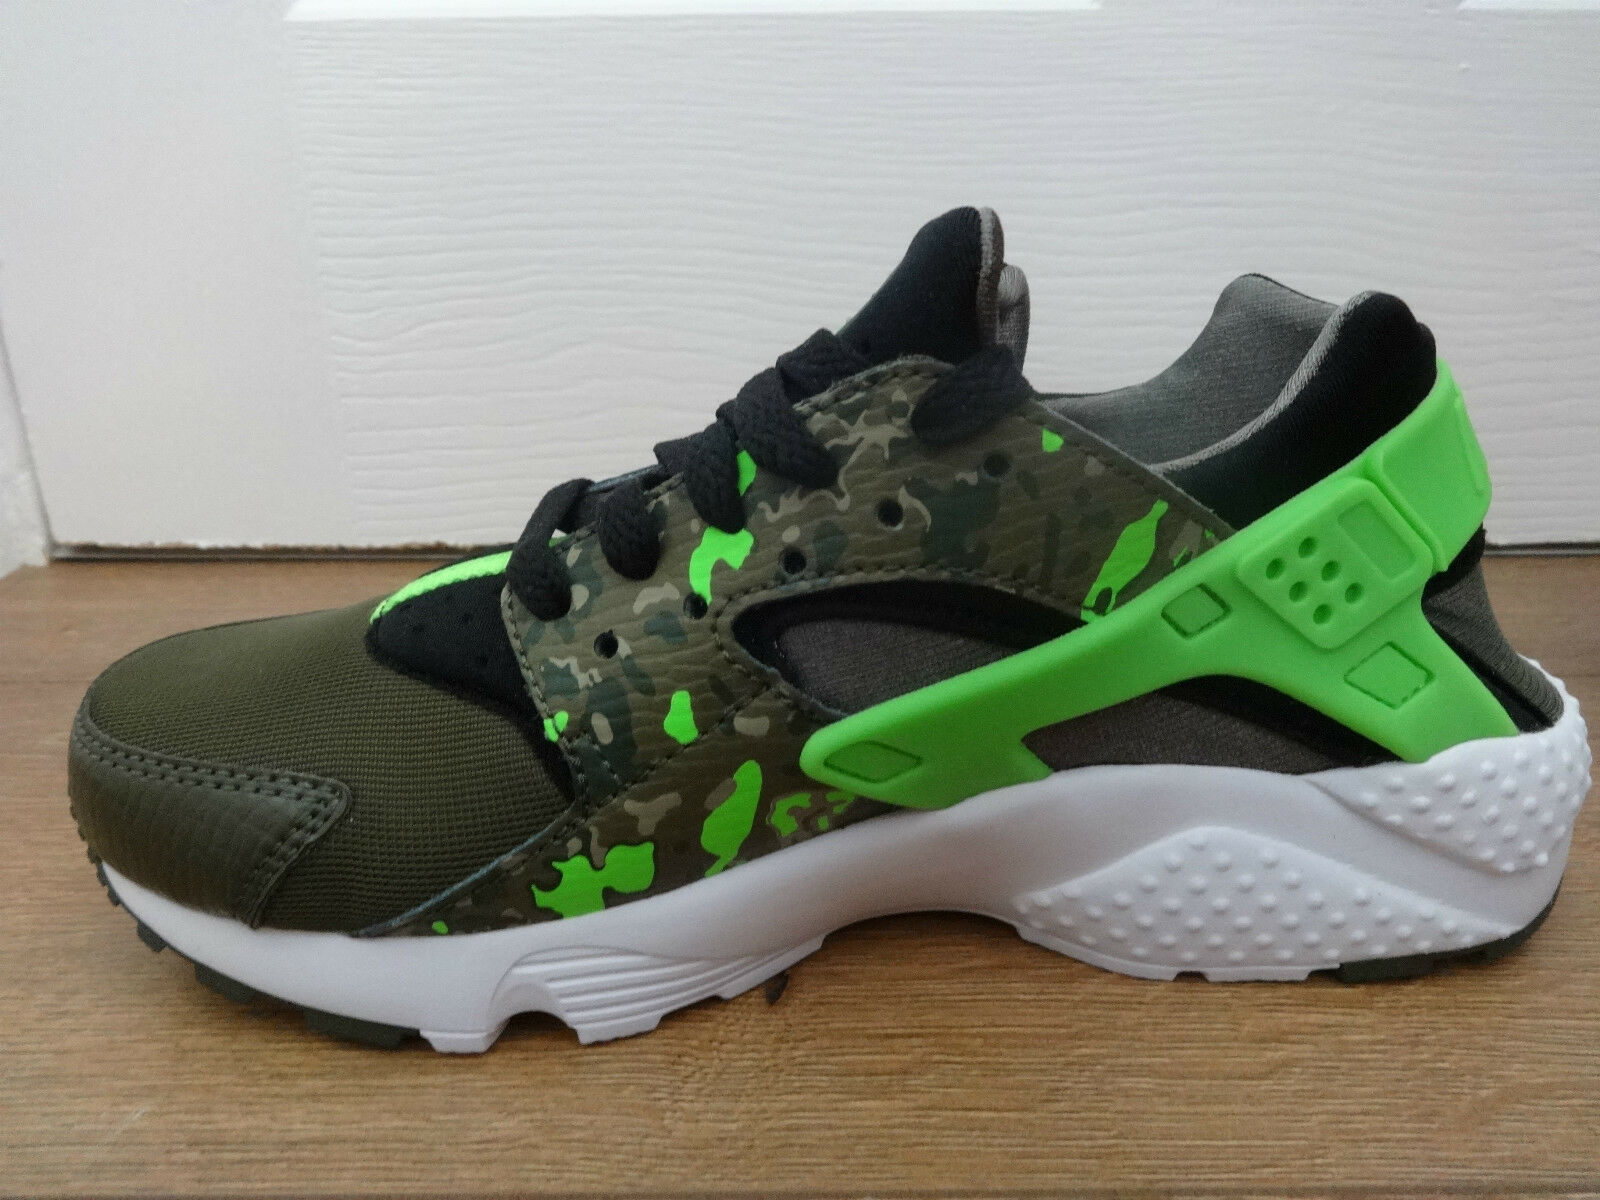 the latest 3f1c9 88b55 Nike Huarache Run Print GS Green Black Kids Womens Running Shoes 704943-007  UK 5  eBay